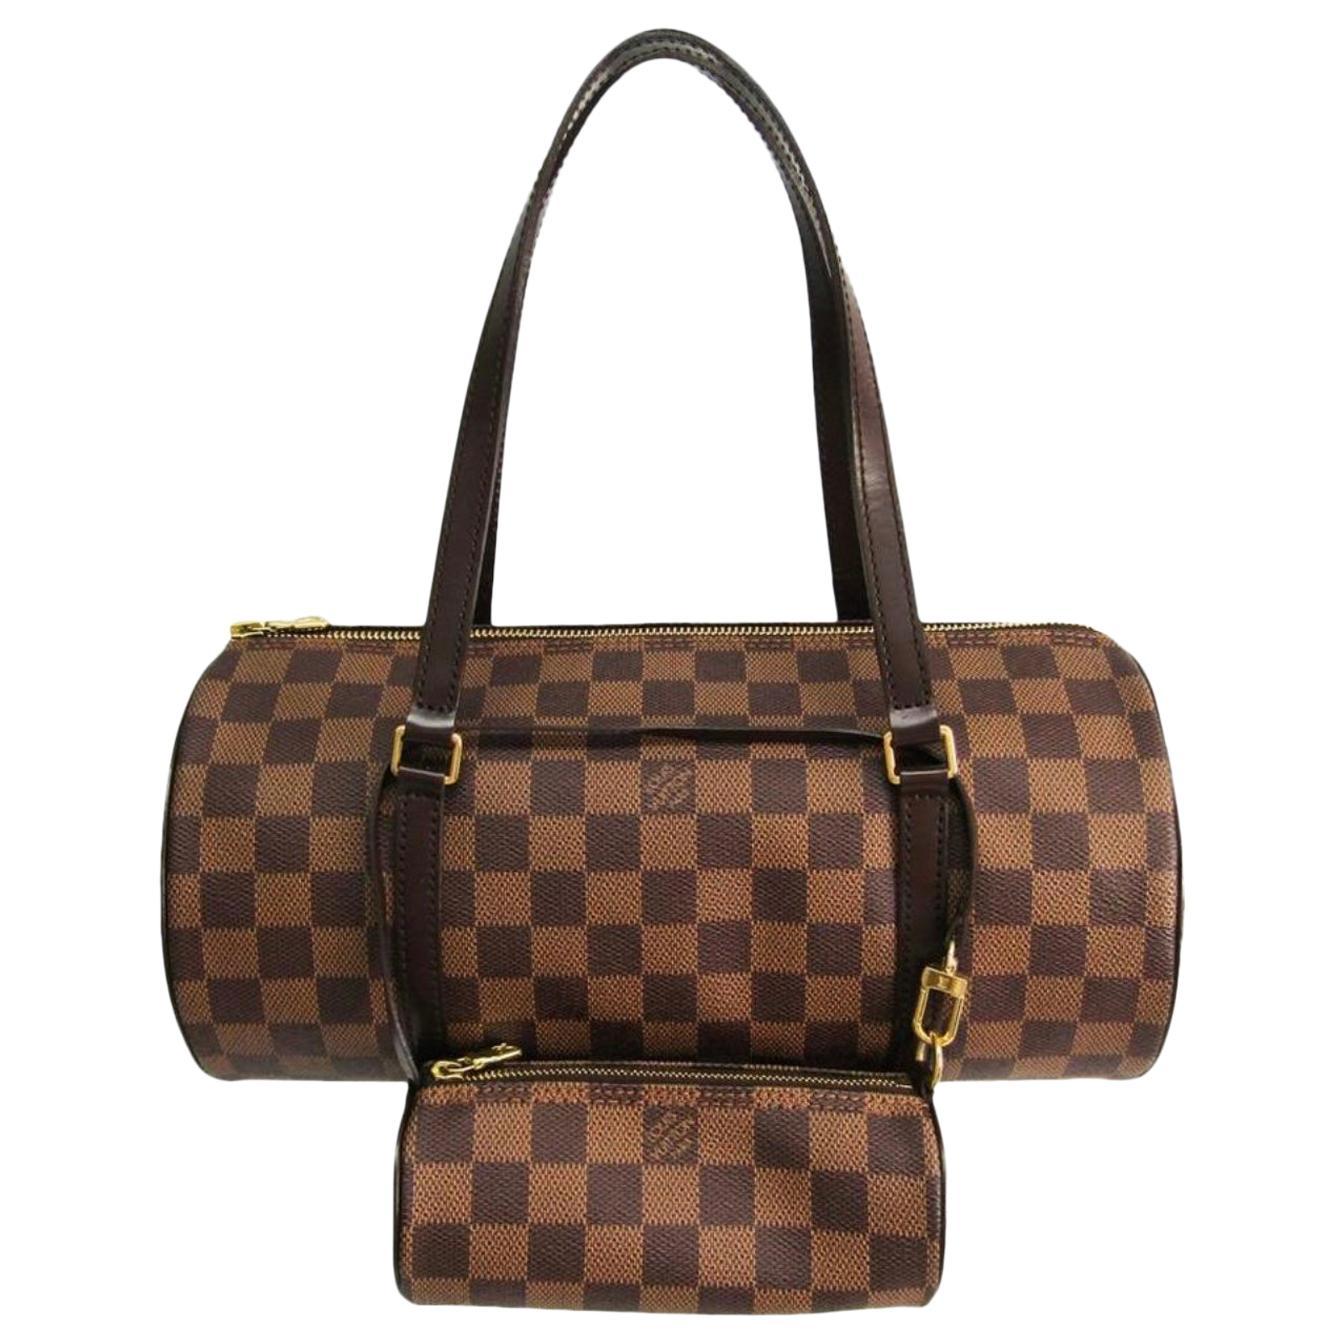 Louis Vuitton Papillon 30 N51303  Handbag Damier Ebene / With Matching Satchel